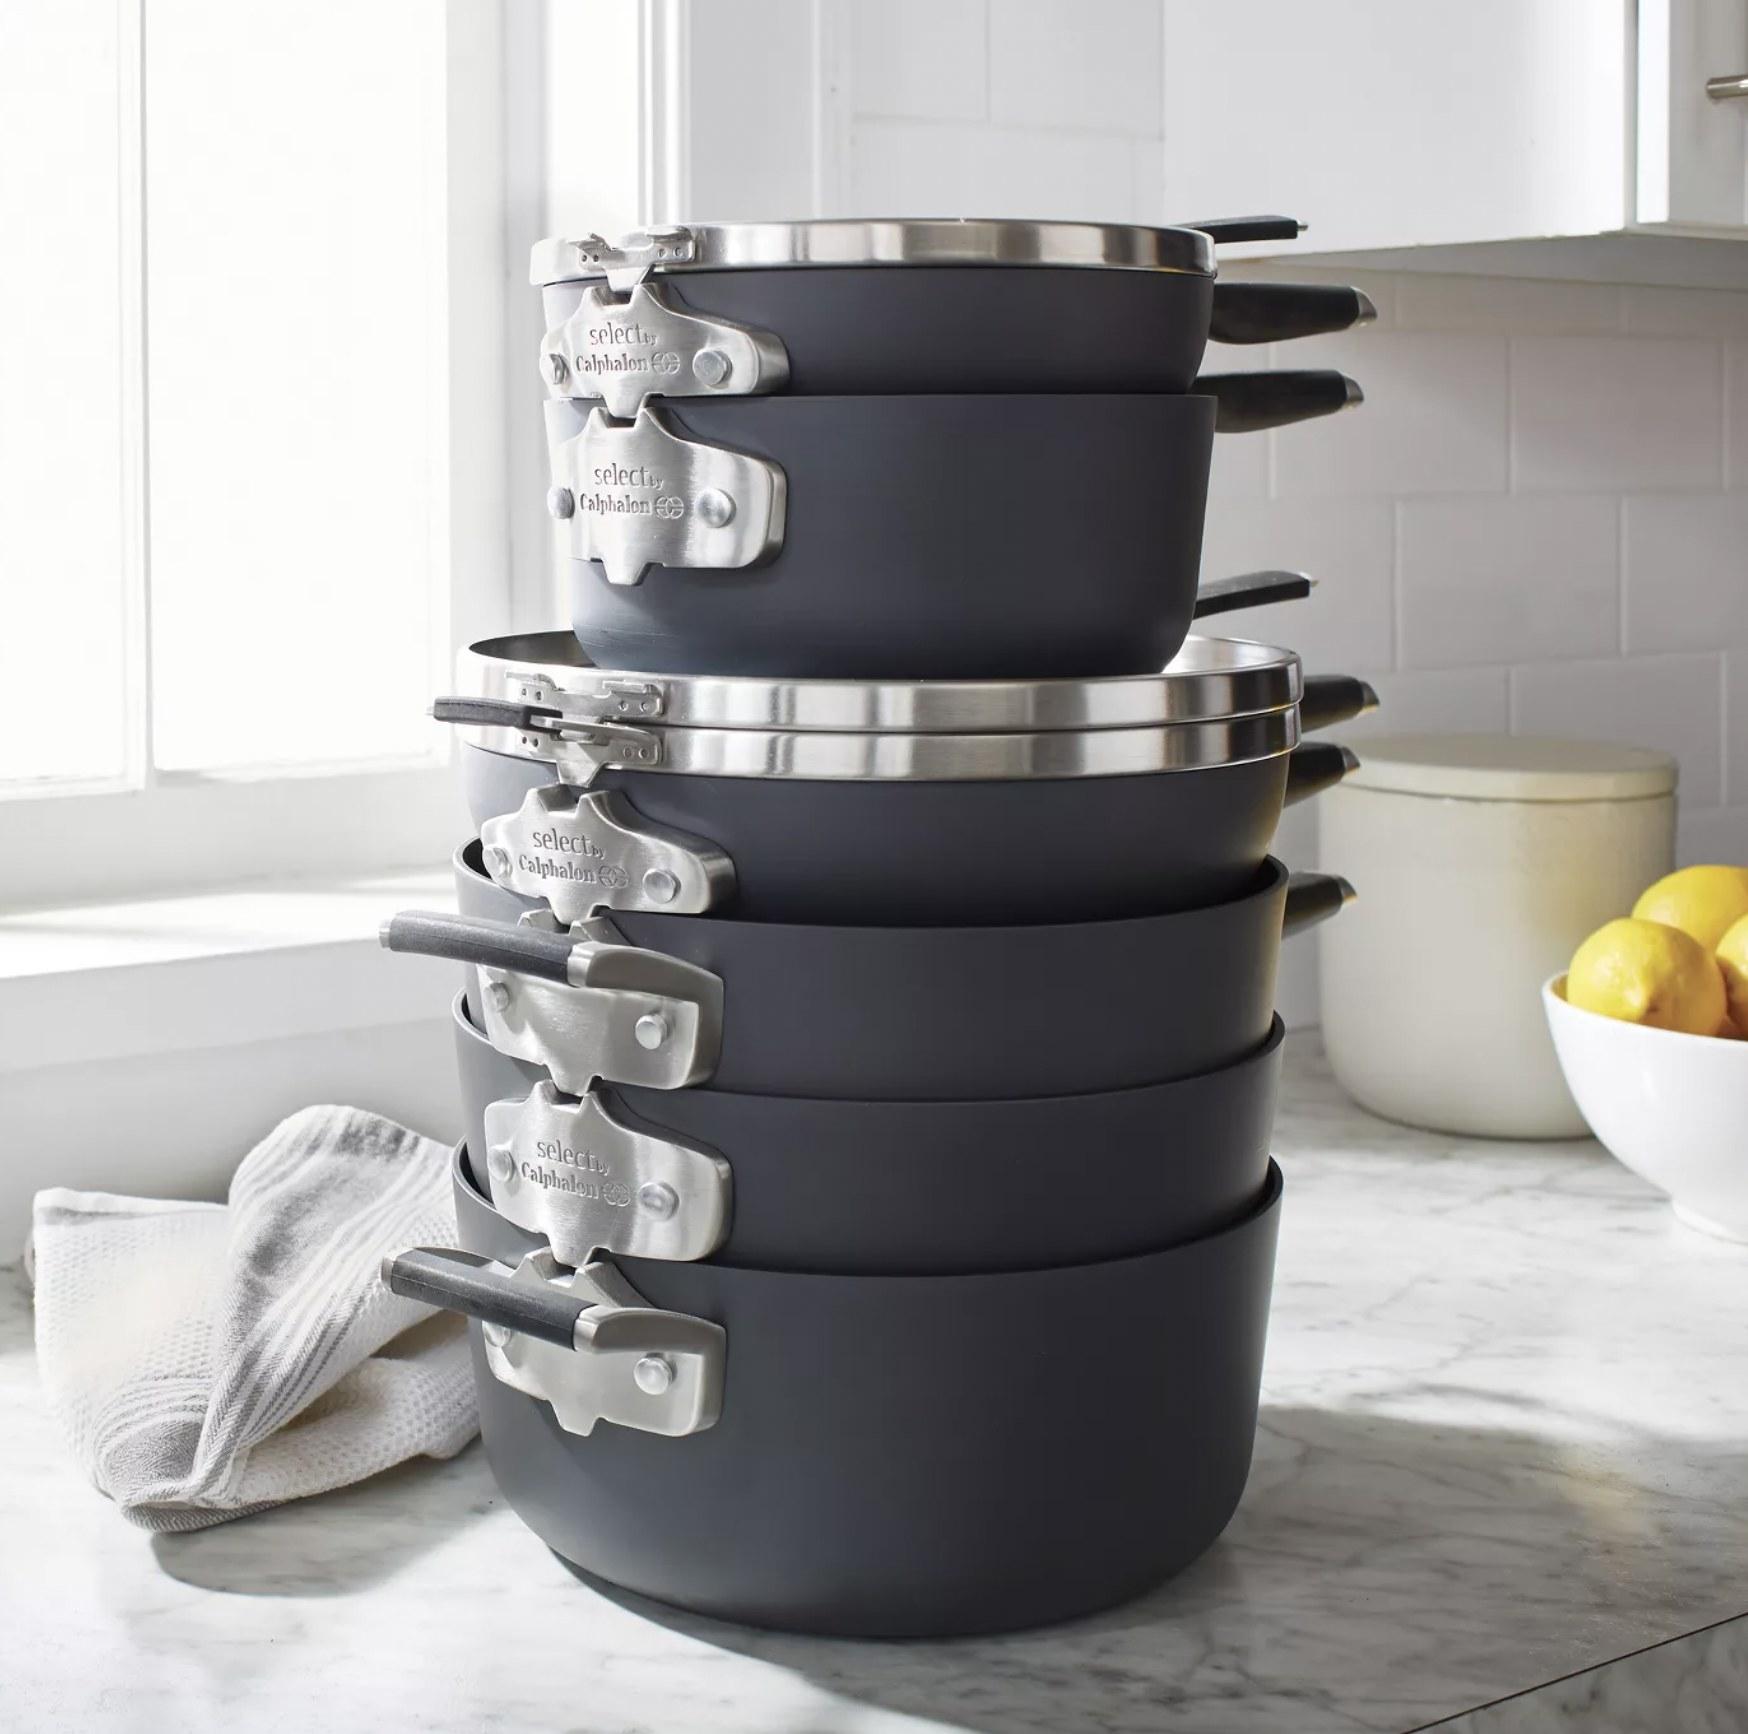 the stackable Calphalon pans